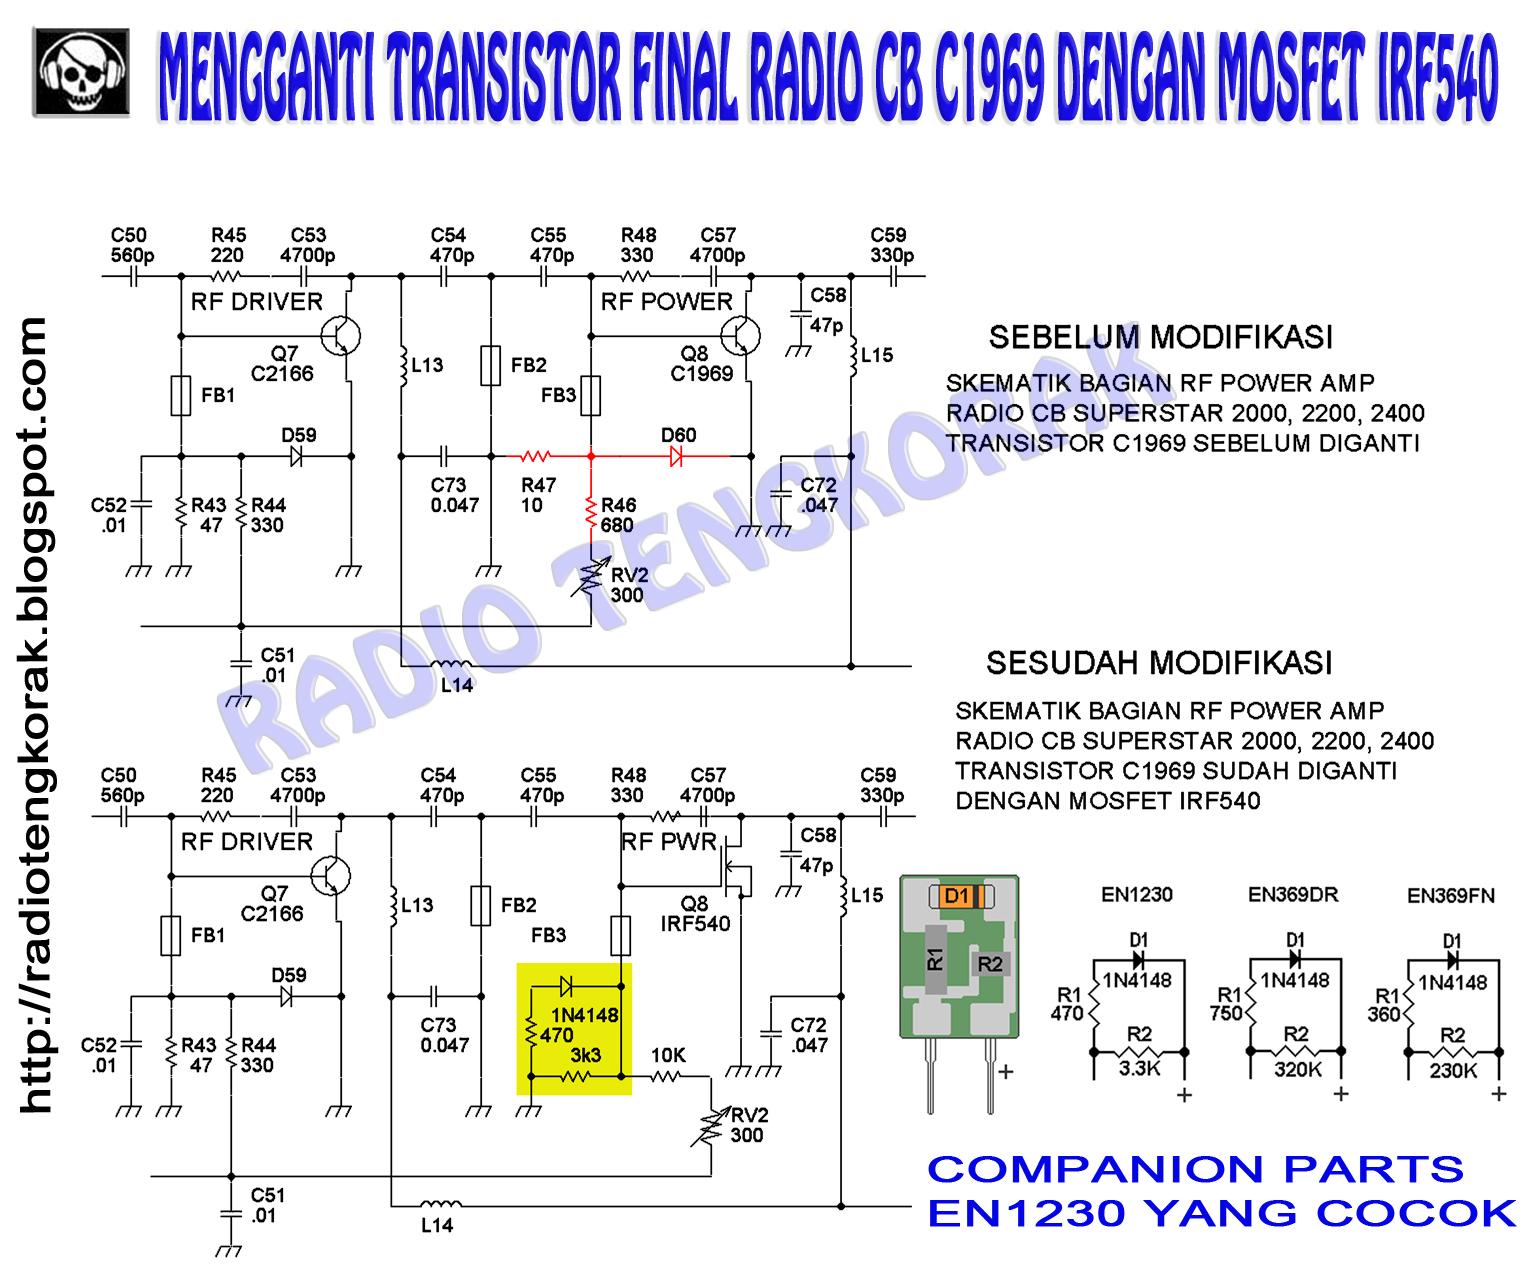 Cb radio final transistor – Car audio systems